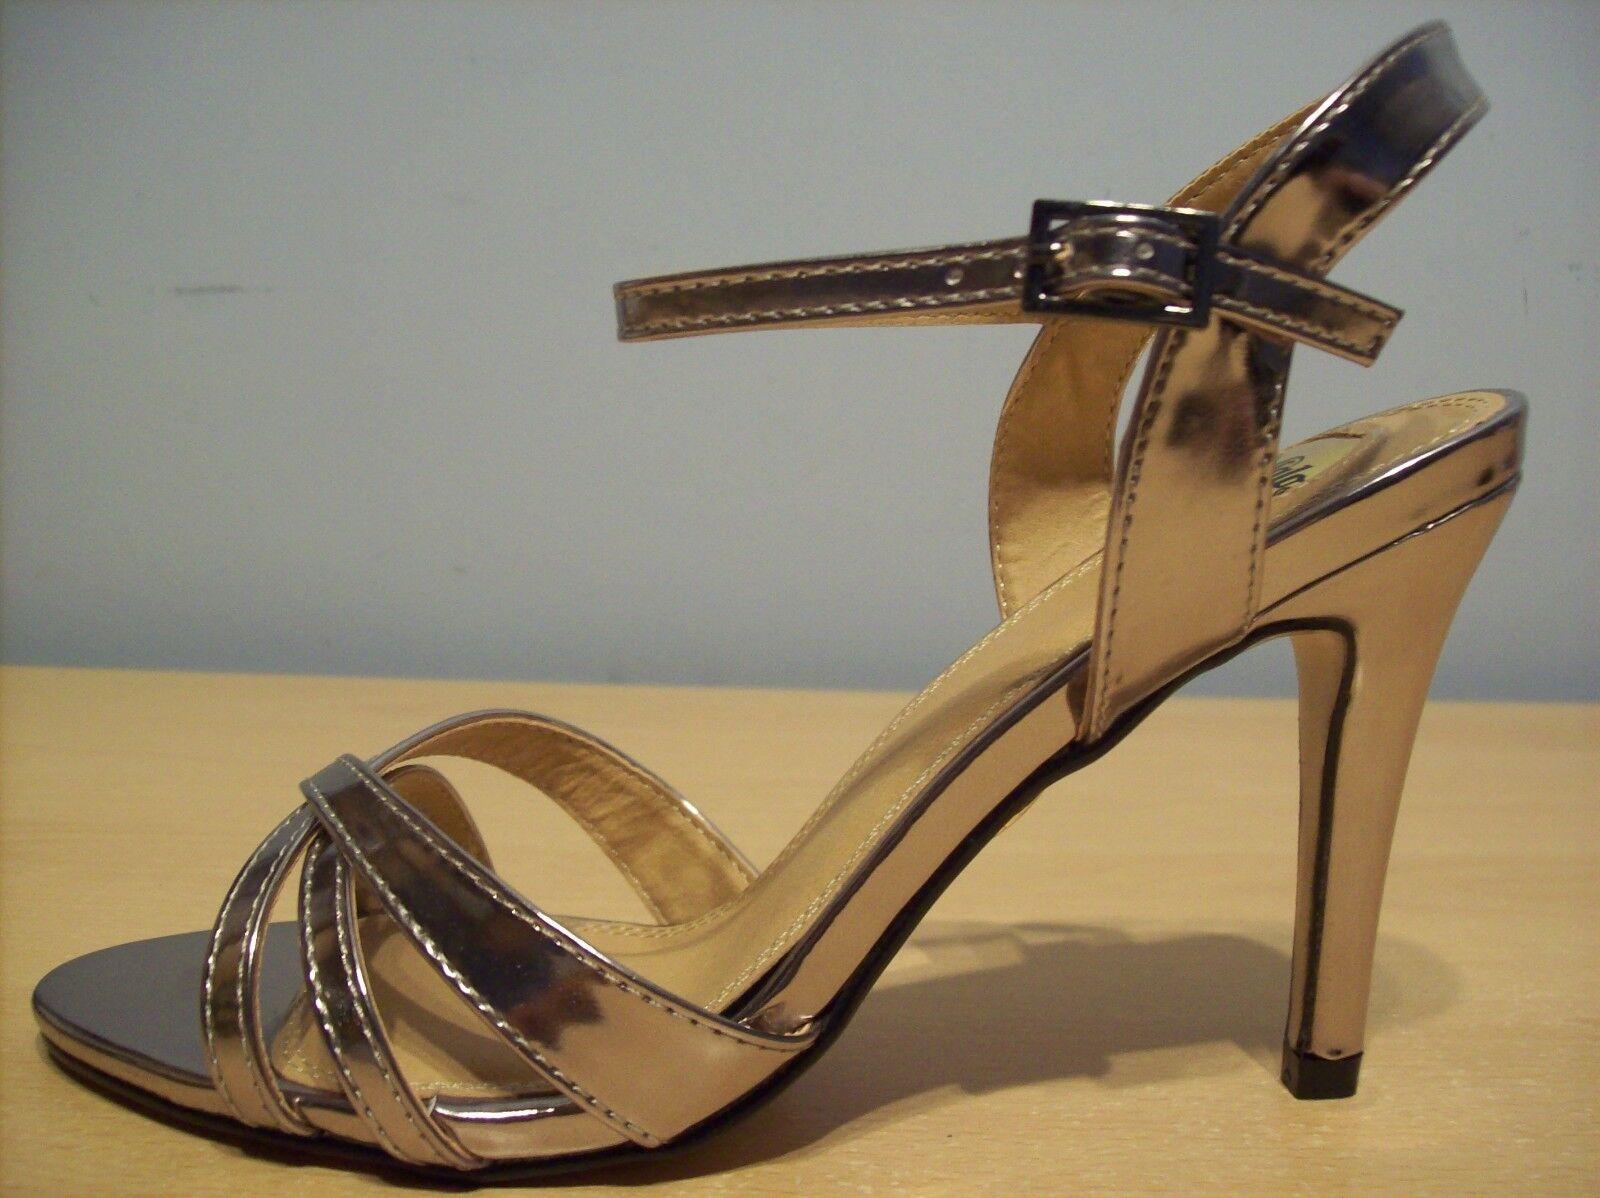 schuhe Buffalo 312703 312703 312703 High Cone Heel Sandals Silber Pewter Größe 6 New + Boxed 189b36